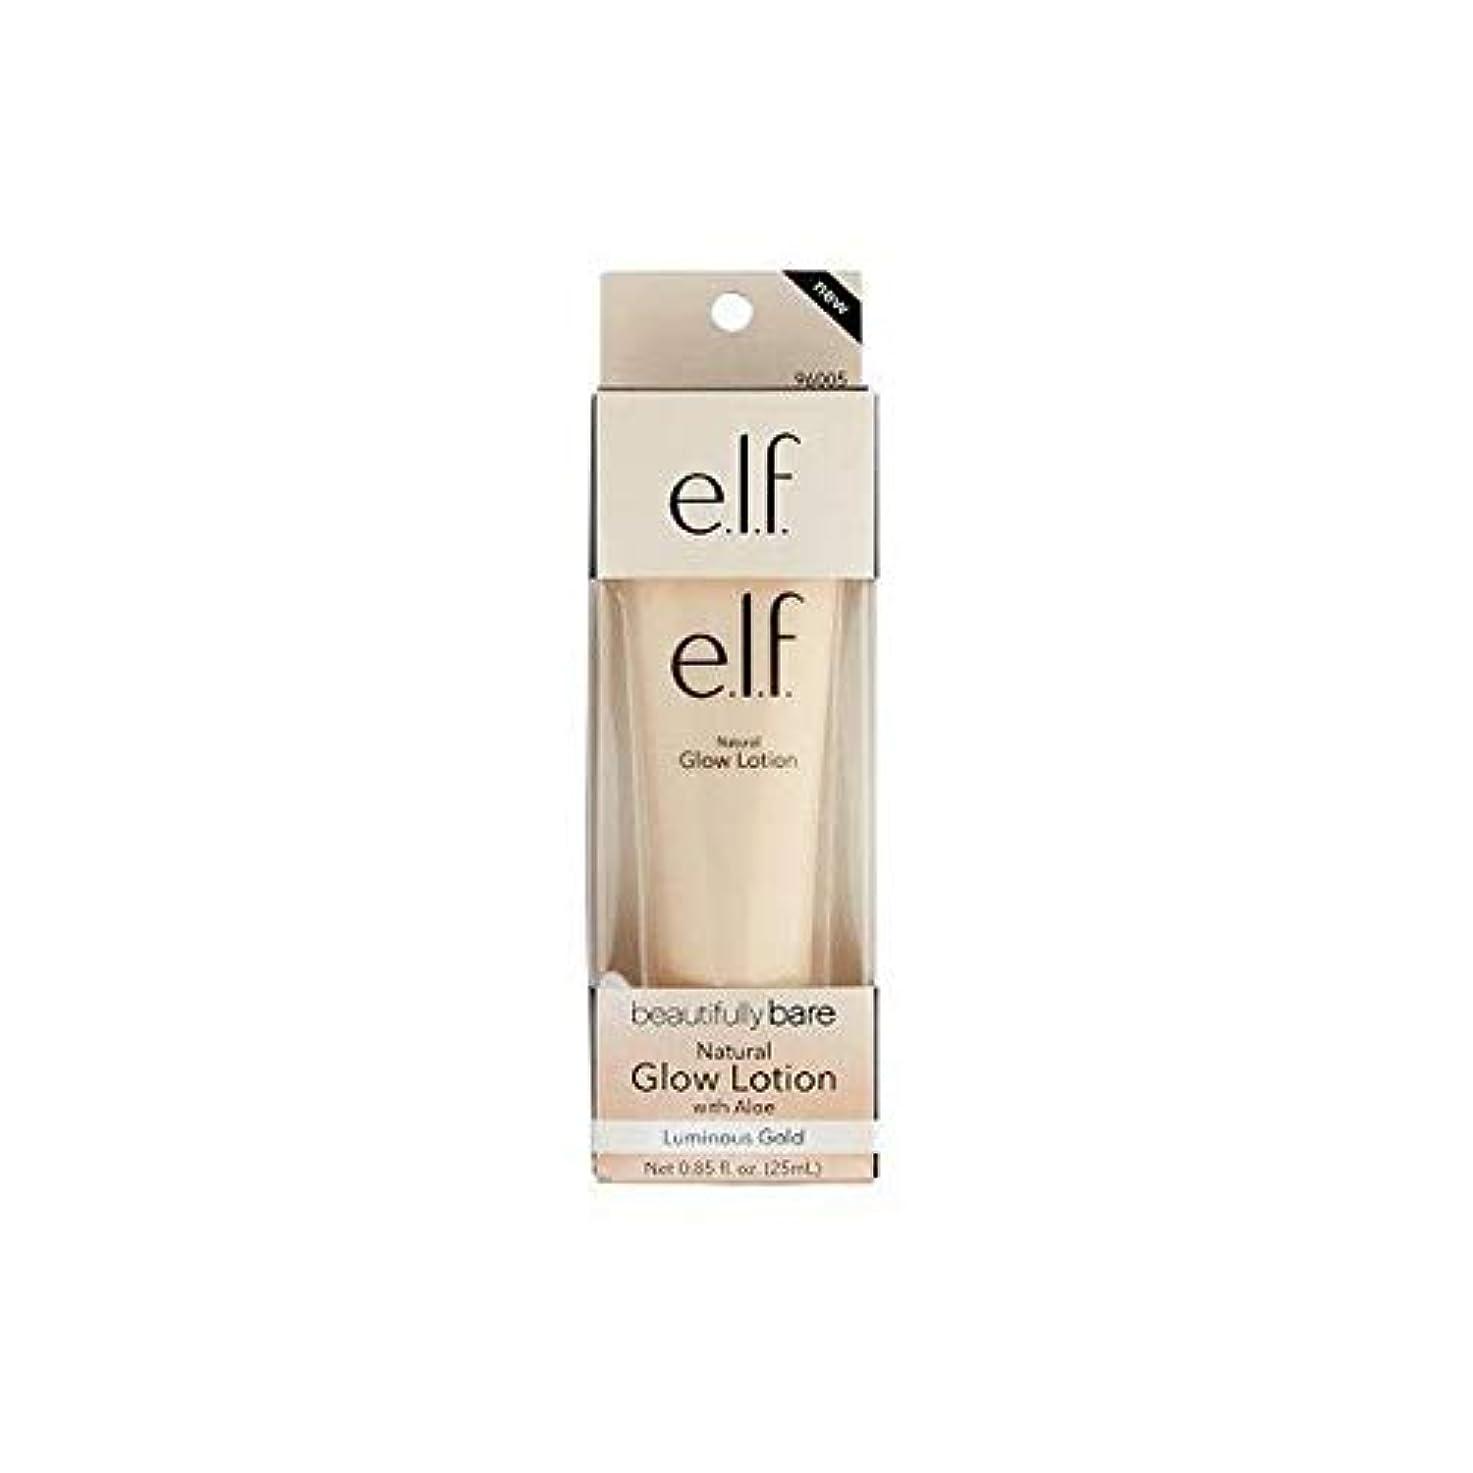 [Elf ] エルフ。美しく裸自然グローローション金 - e.l.f. Beautifully Bare Natural Glow Lotion gold [並行輸入品]